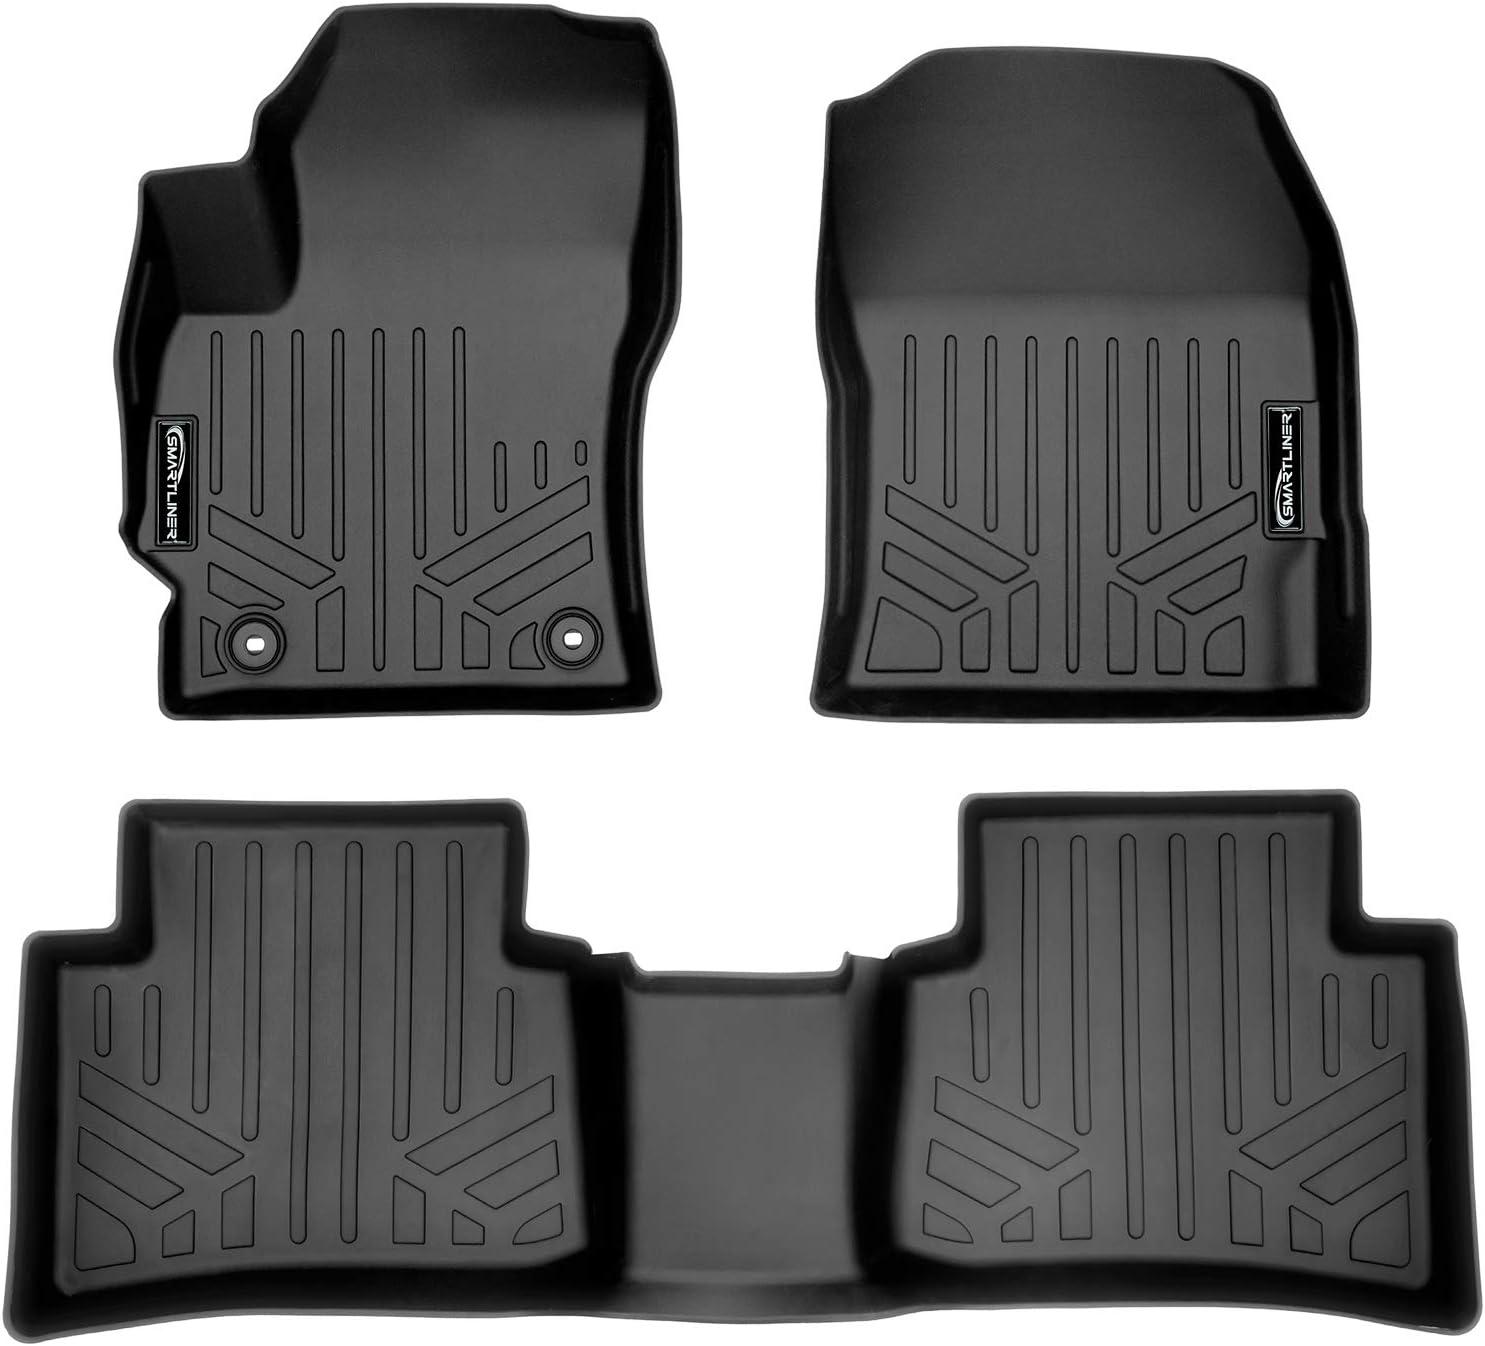 SMARTLINER Custom Fit Floor Mats 2 Row Liner Set Black for 2020 Toyota Corolla Sedan